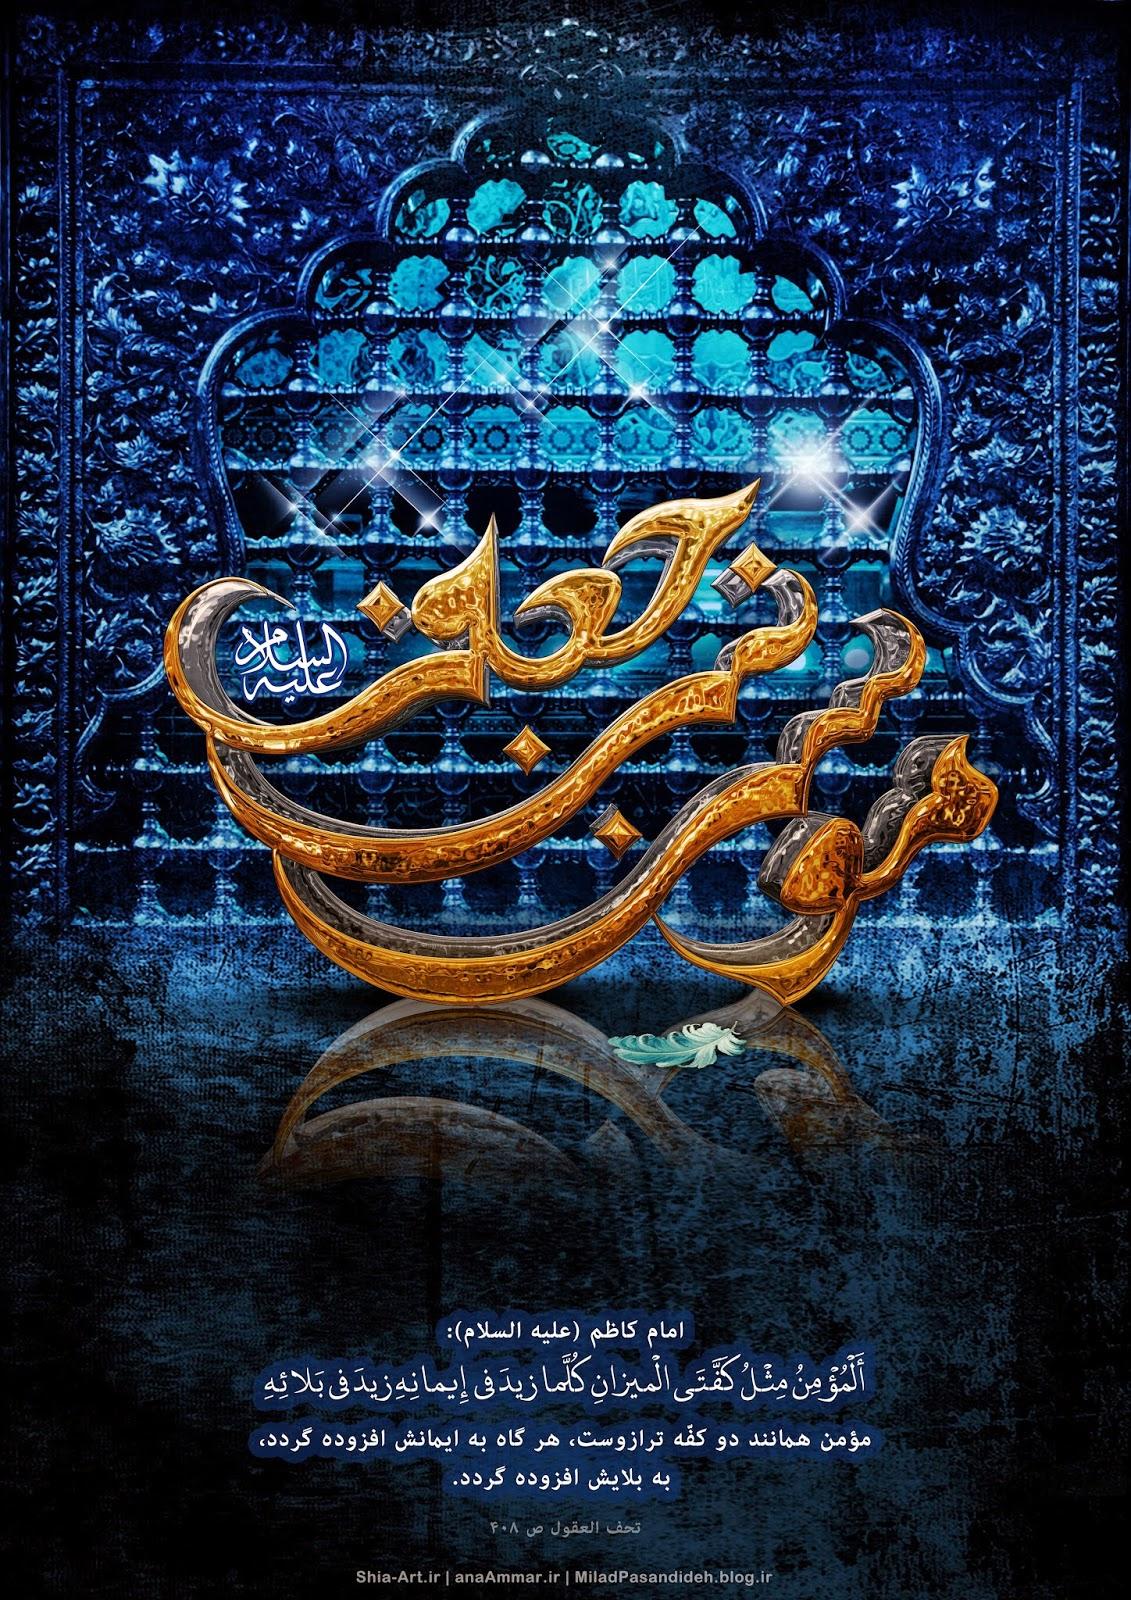 پوستر | باب الحوائج ، موسی بن جعفر (علیه السلام) +مداحی حاج محمود کریمی